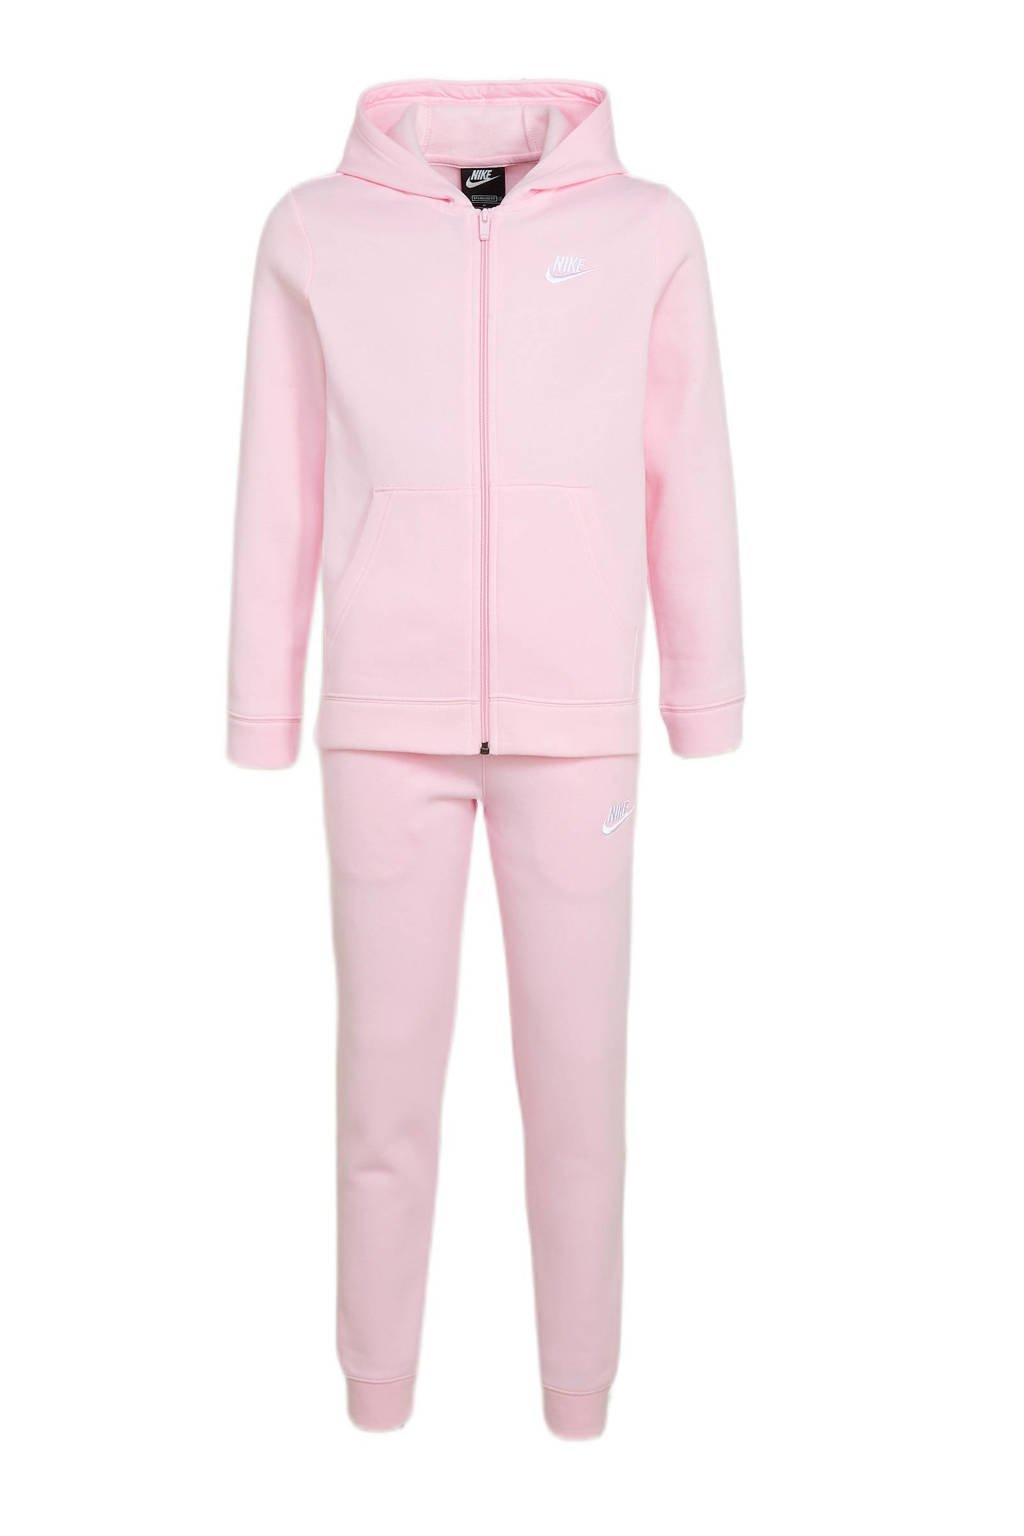 Nike joggingpak roze, Roze